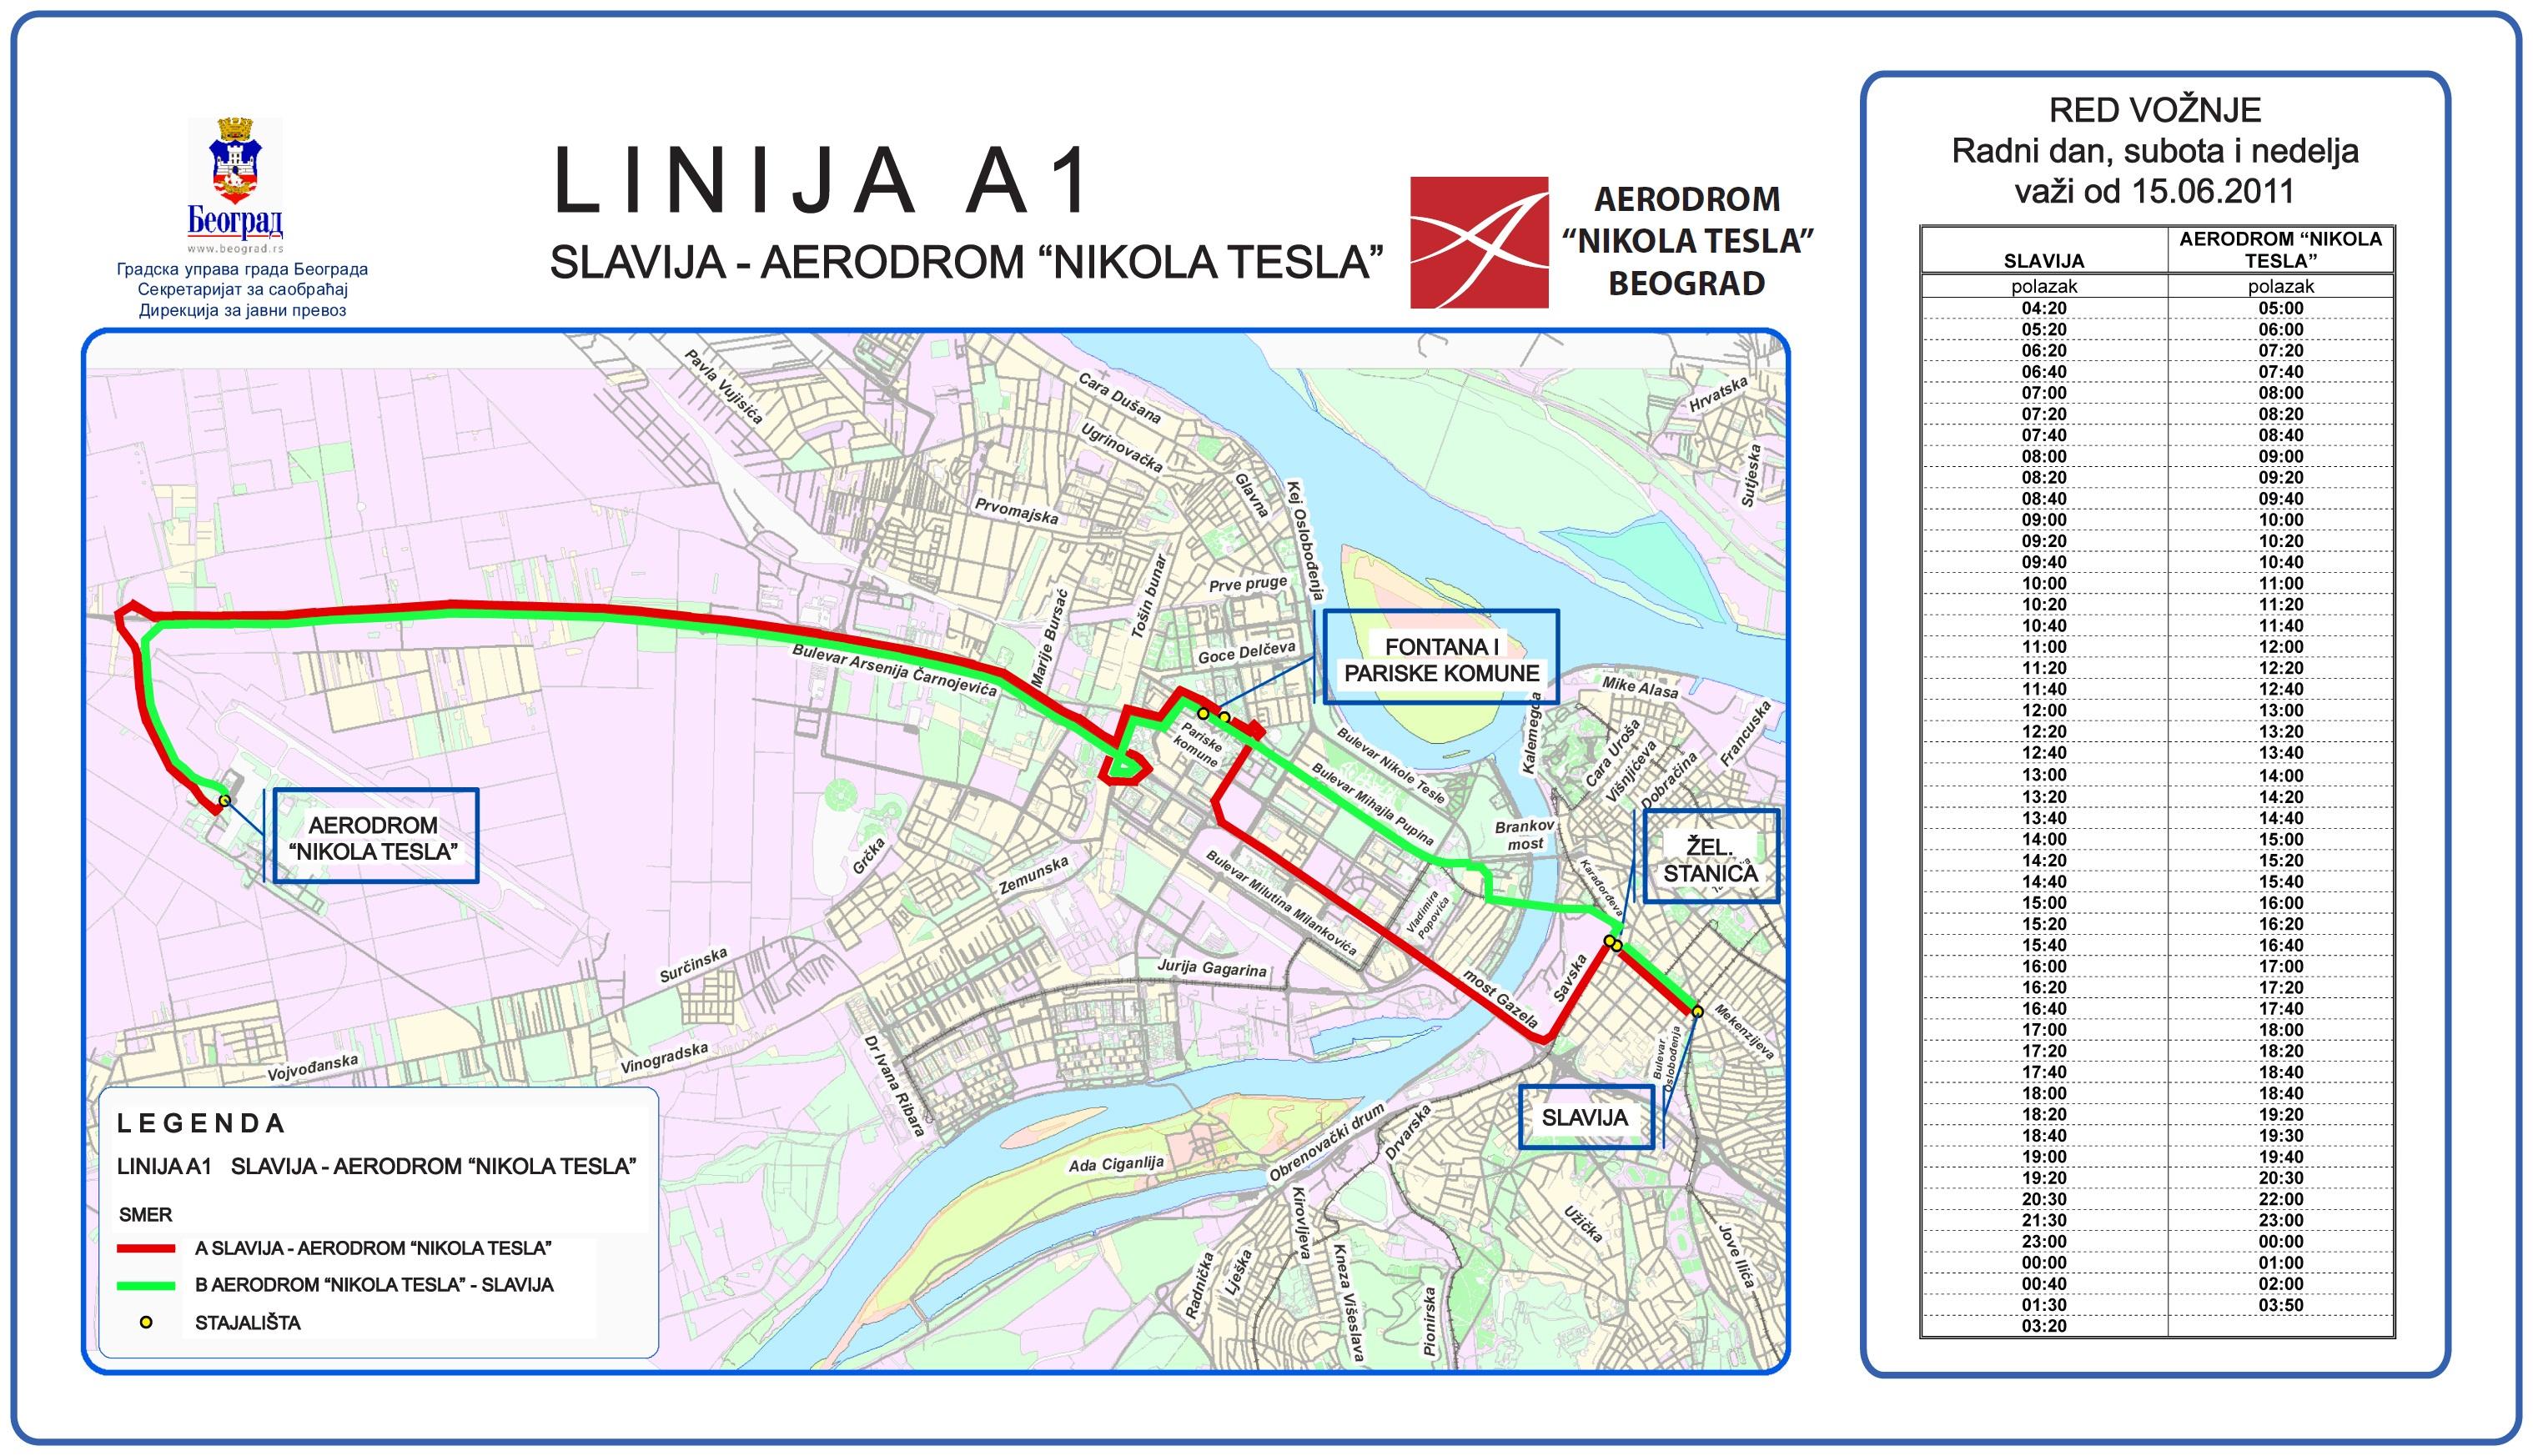 aerodrom nikola tesla mapa Duletov blog | Aerodrom Nikola Tesla u Beogradu i taksi  aerodrom nikola tesla mapa